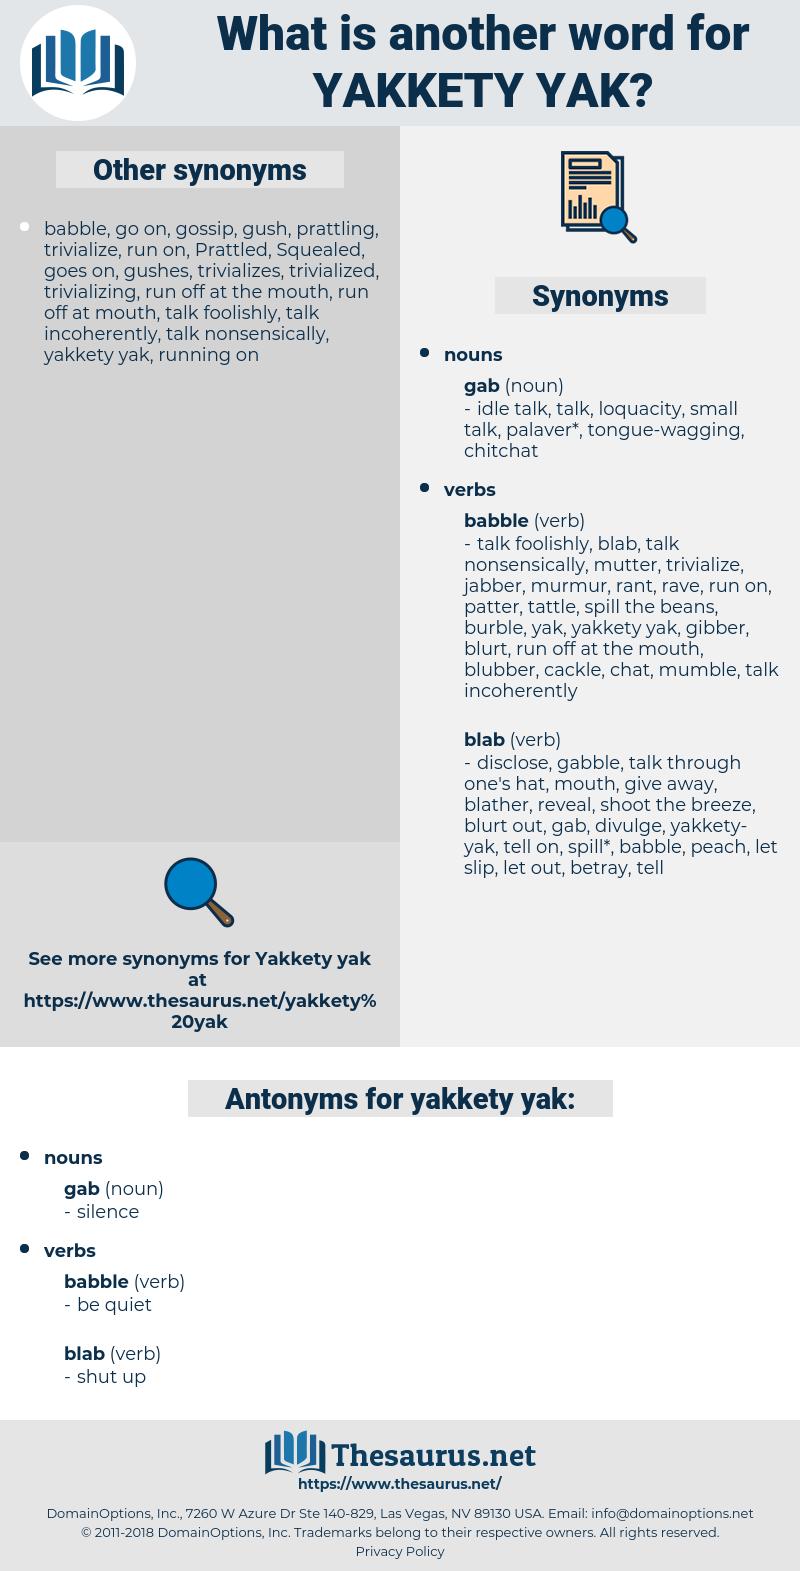 yakkety-yak, synonym yakkety-yak, another word for yakkety-yak, words like yakkety-yak, thesaurus yakkety-yak